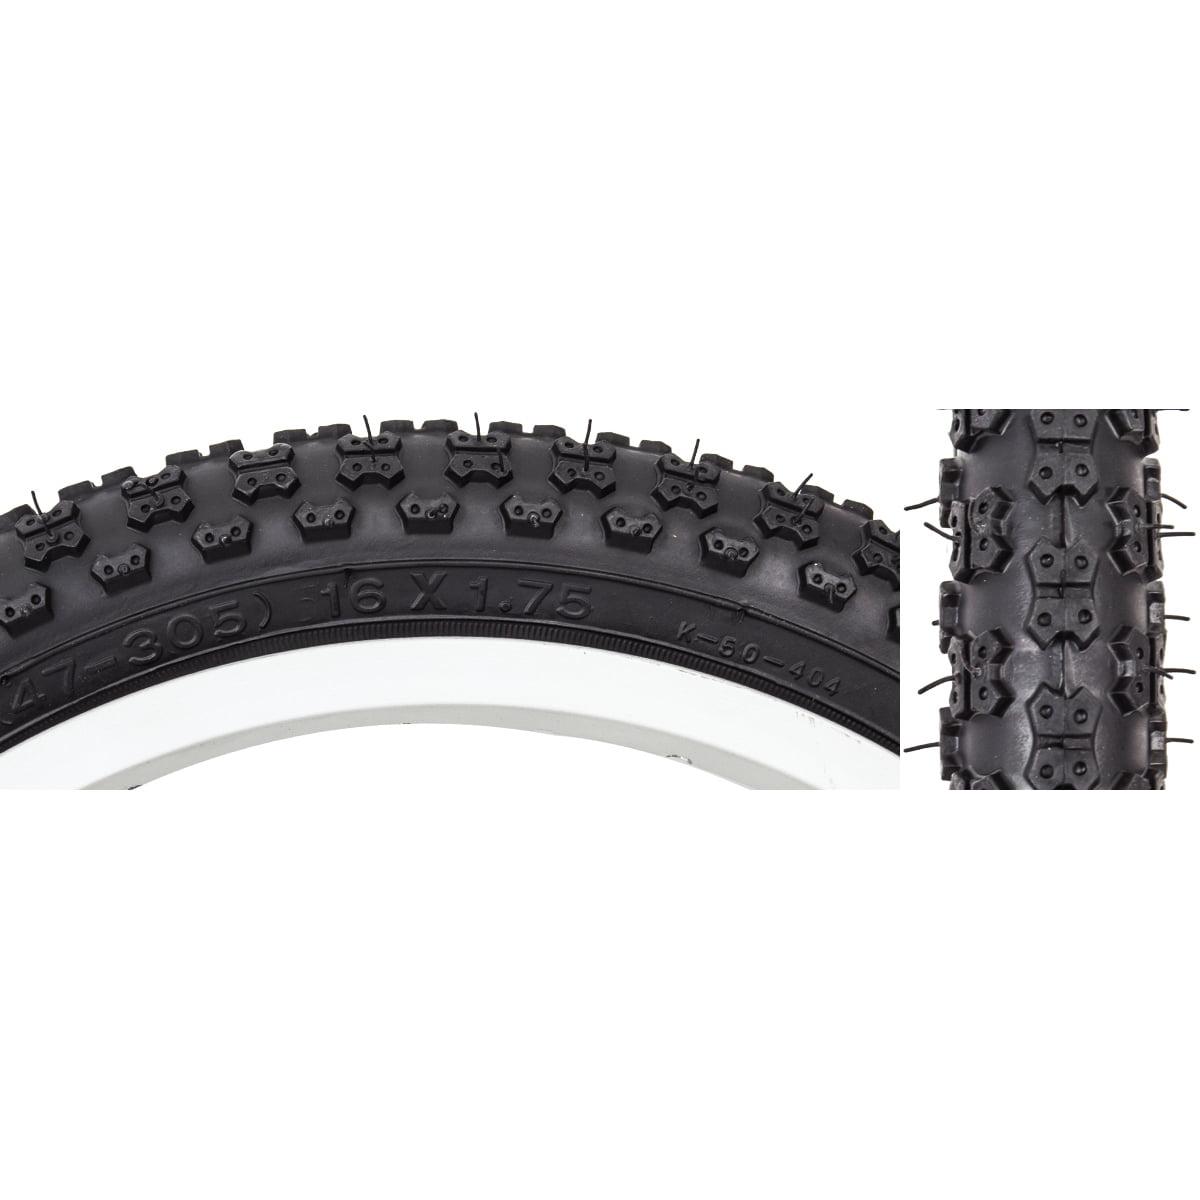 Sunlite Tire 16X1.75 Black/Black Mx3 K50